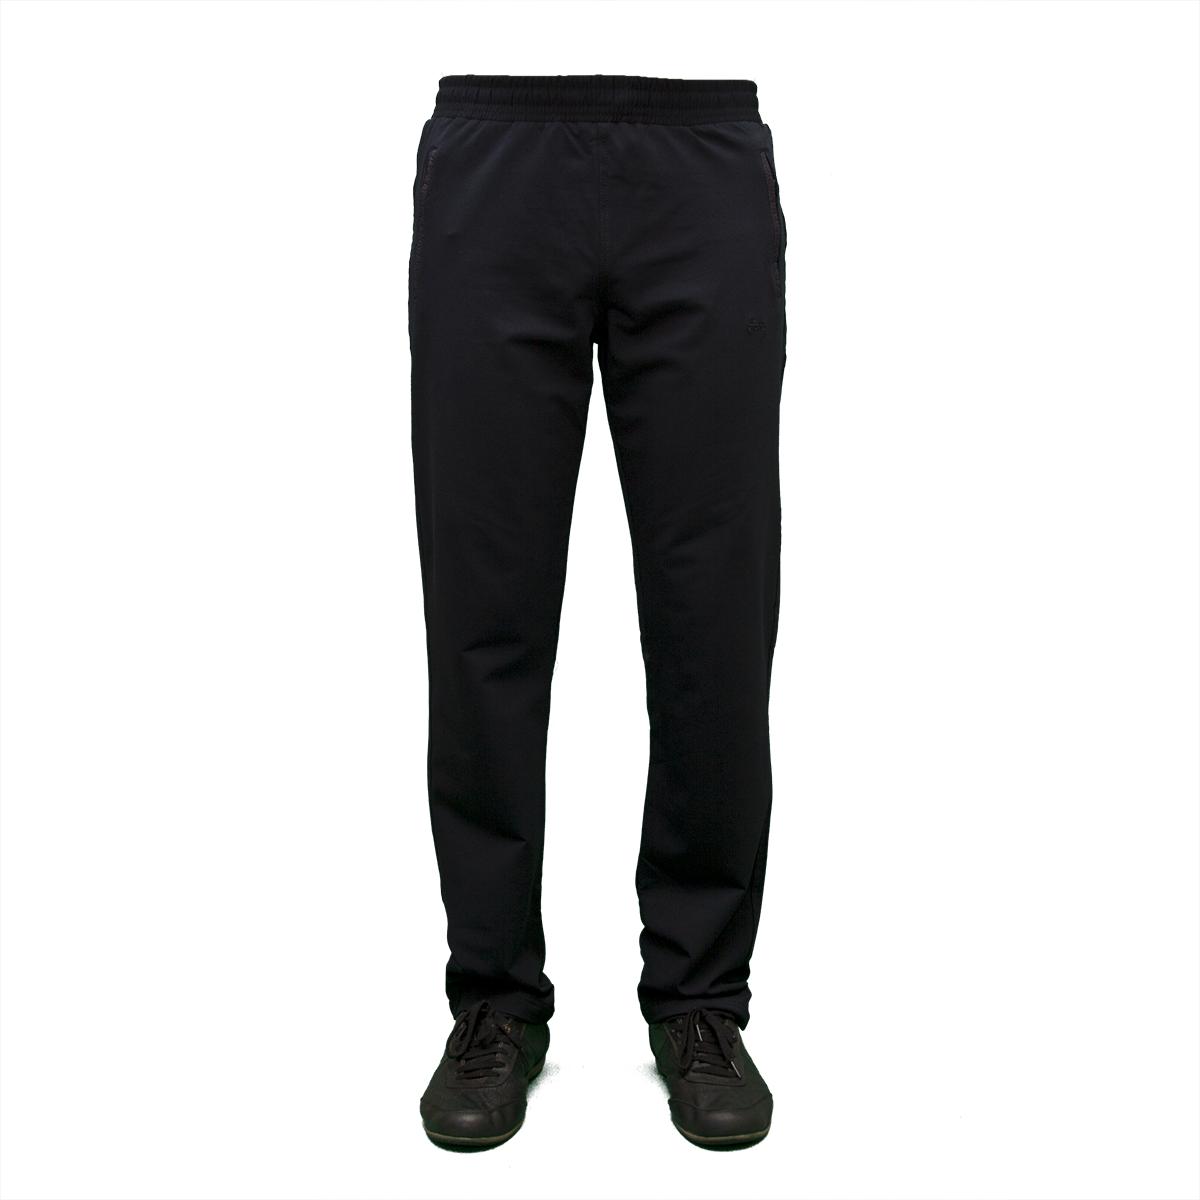 Мужские спортивные брюки трикотаж по низким ценам  тм. FORE арт.9278